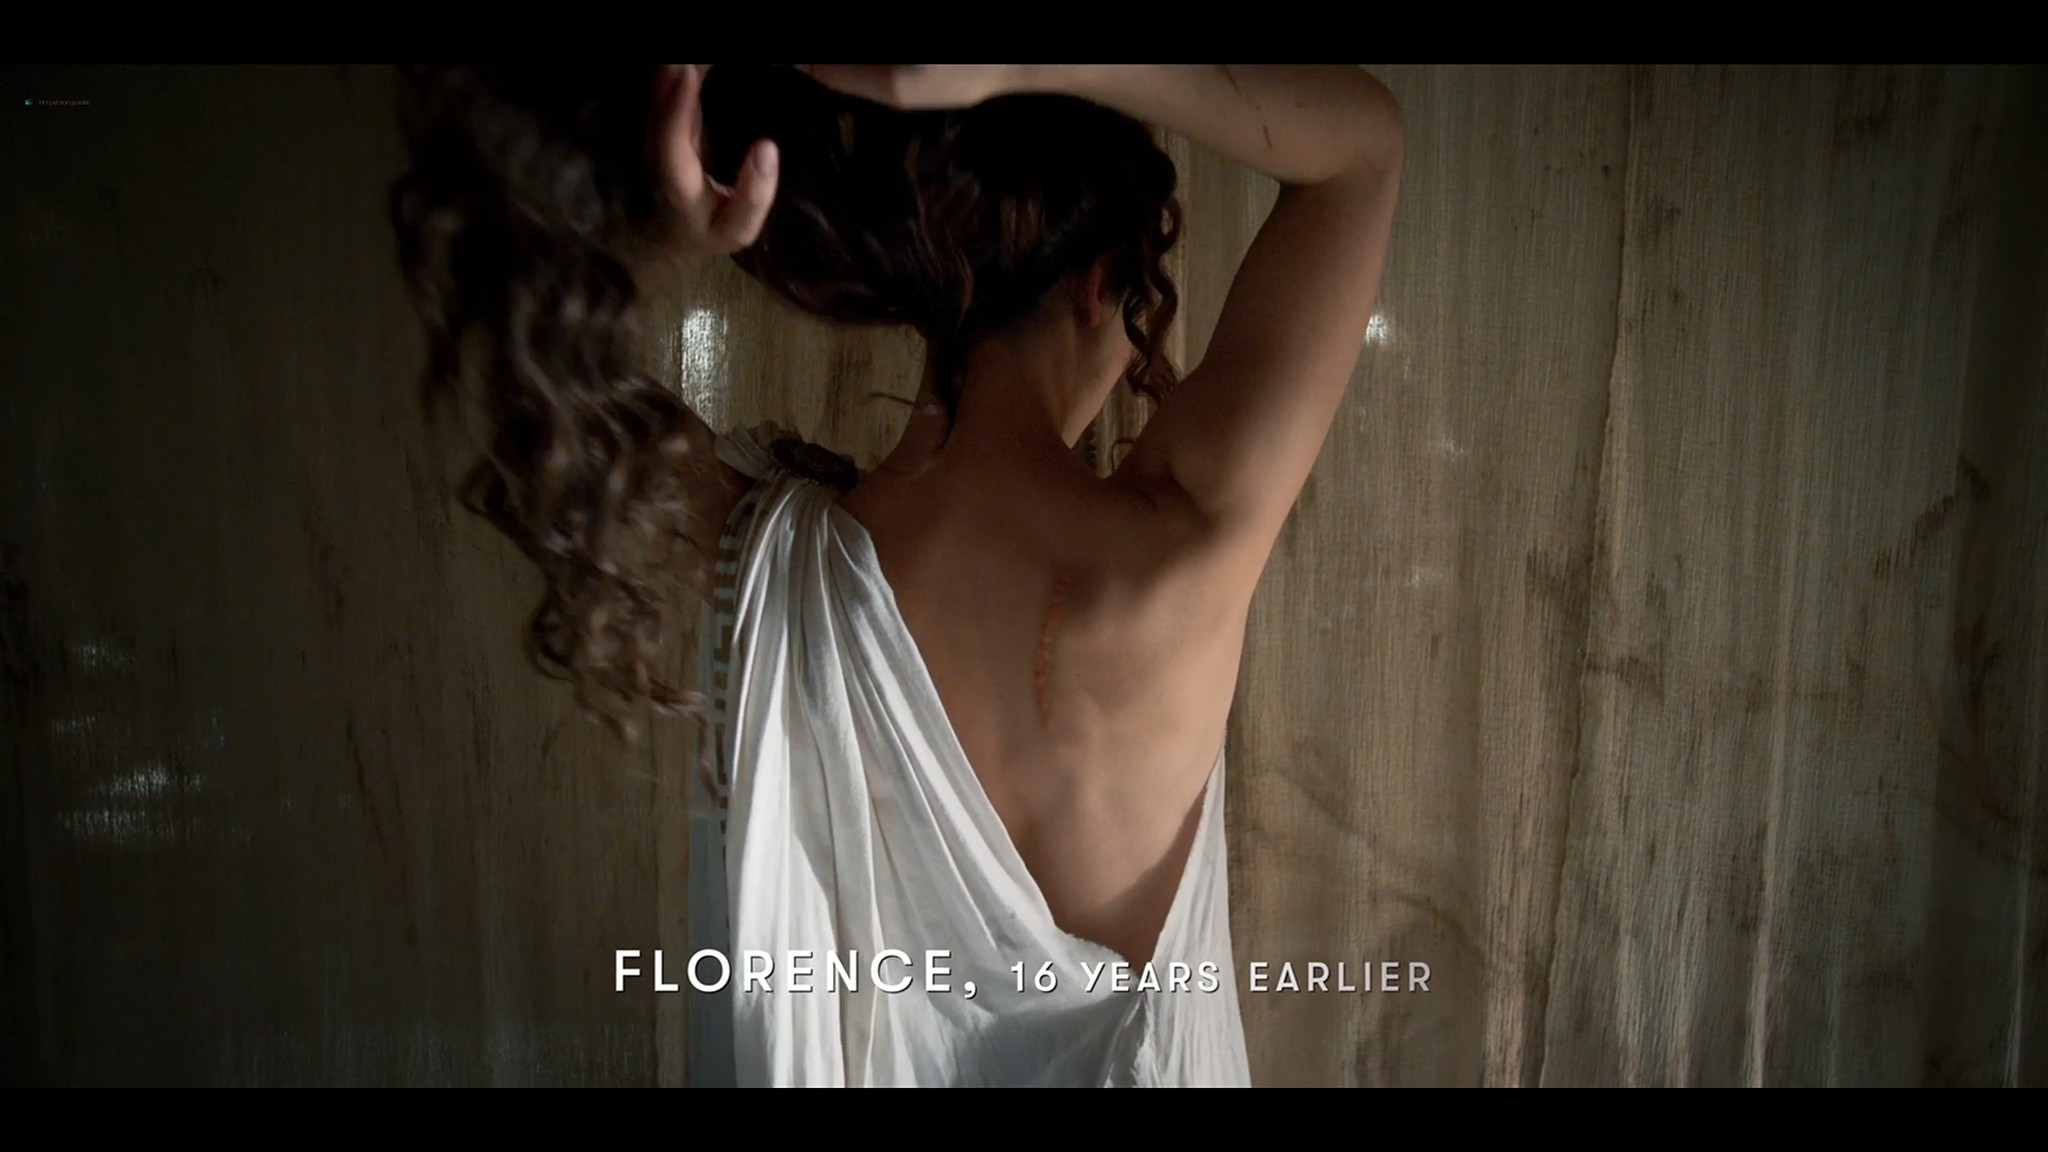 Matilda De Angelis nude full frontal Leonardo 2021 S1 1080p Web